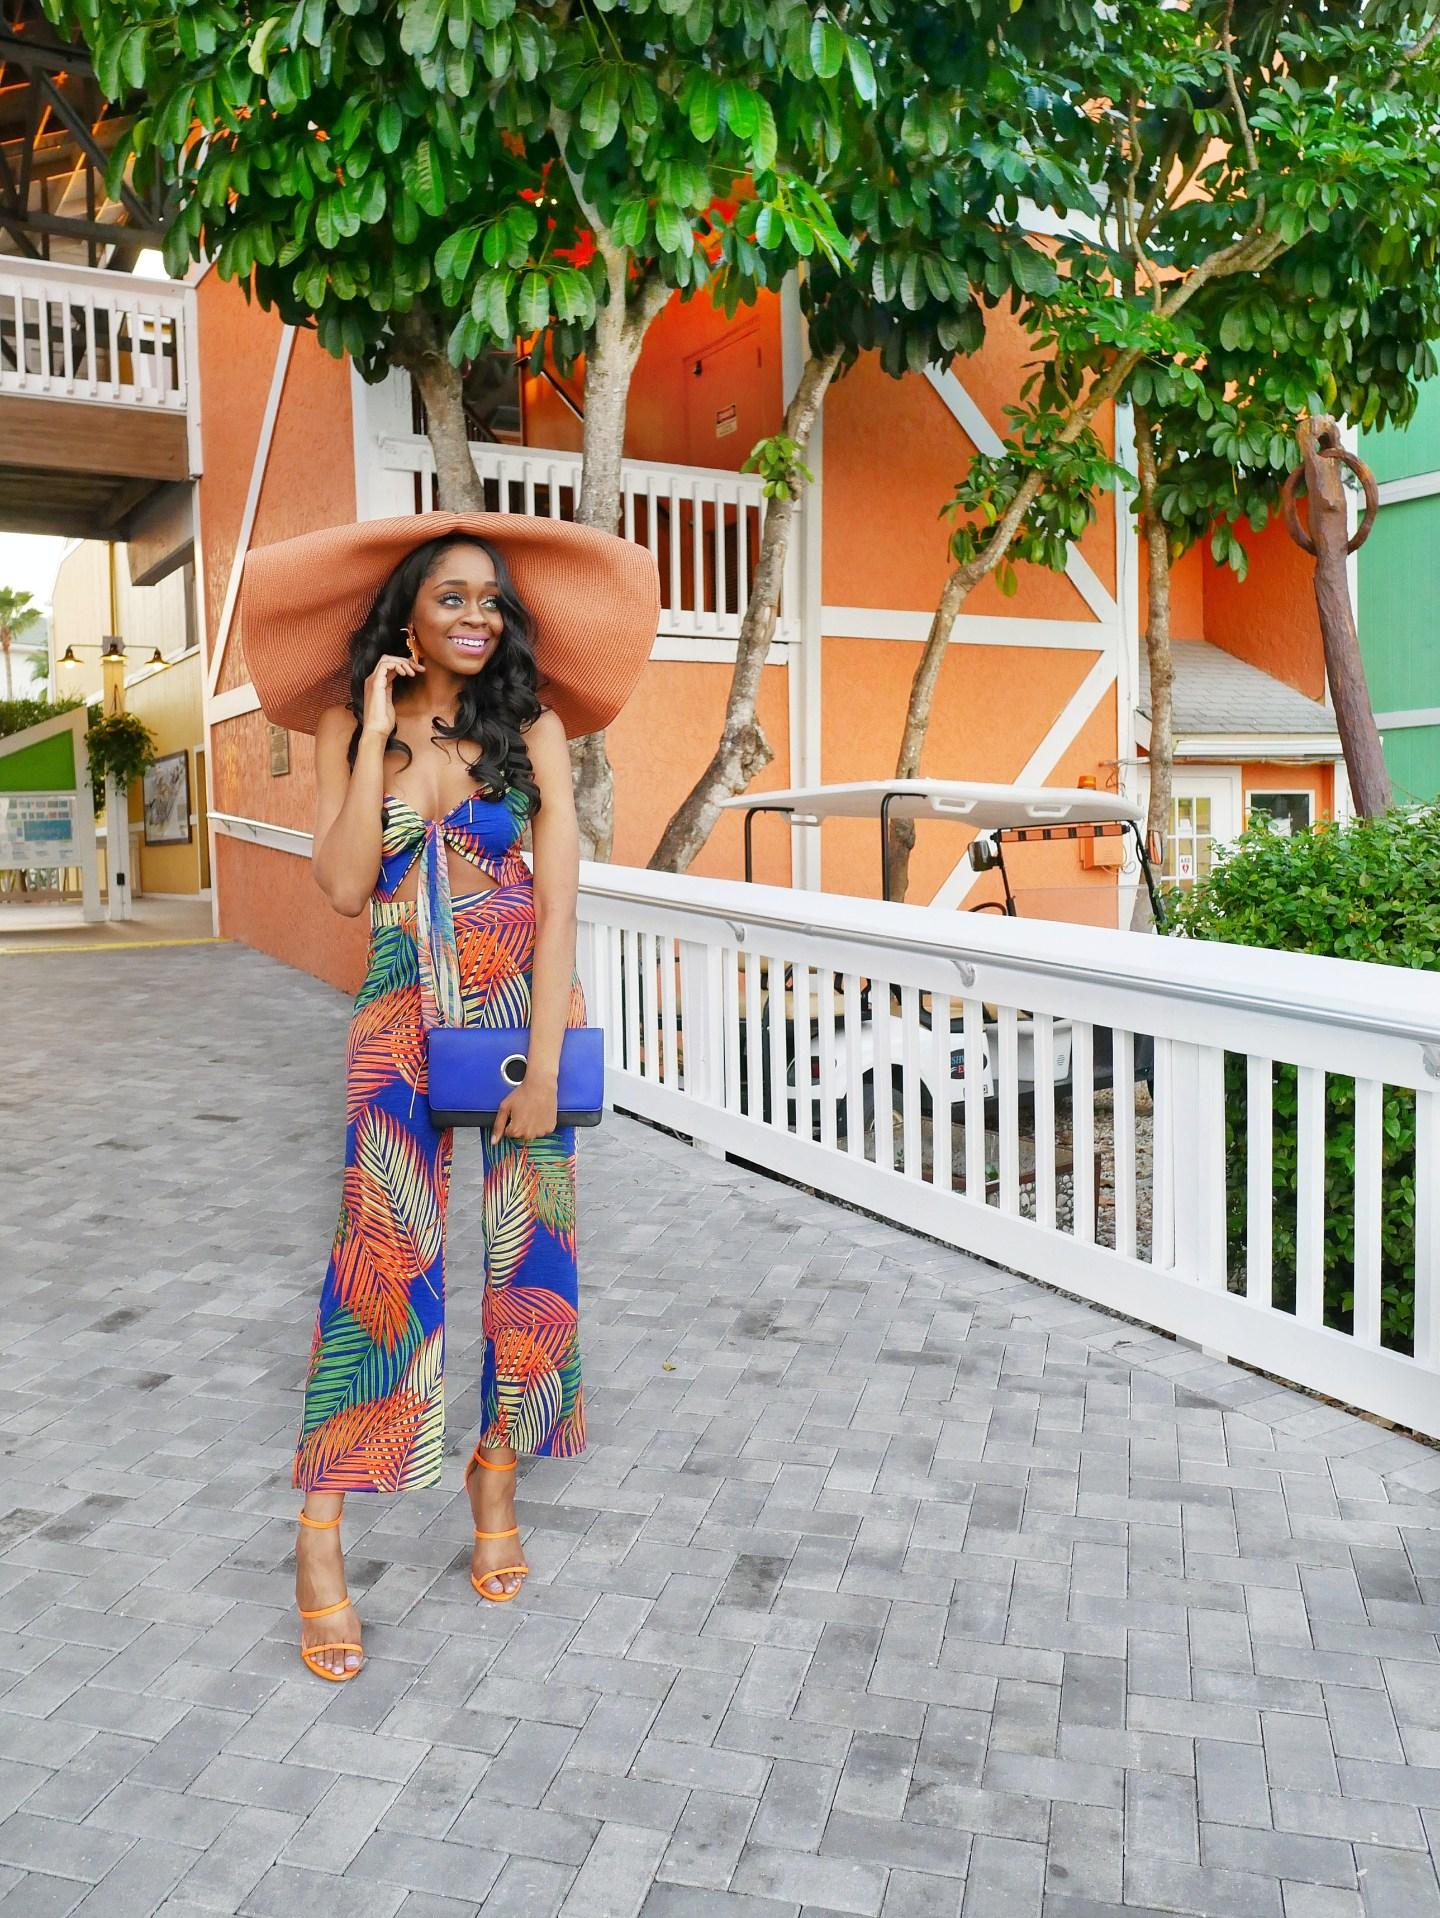 Punta Gorda – Things to Do in West Coast Florida